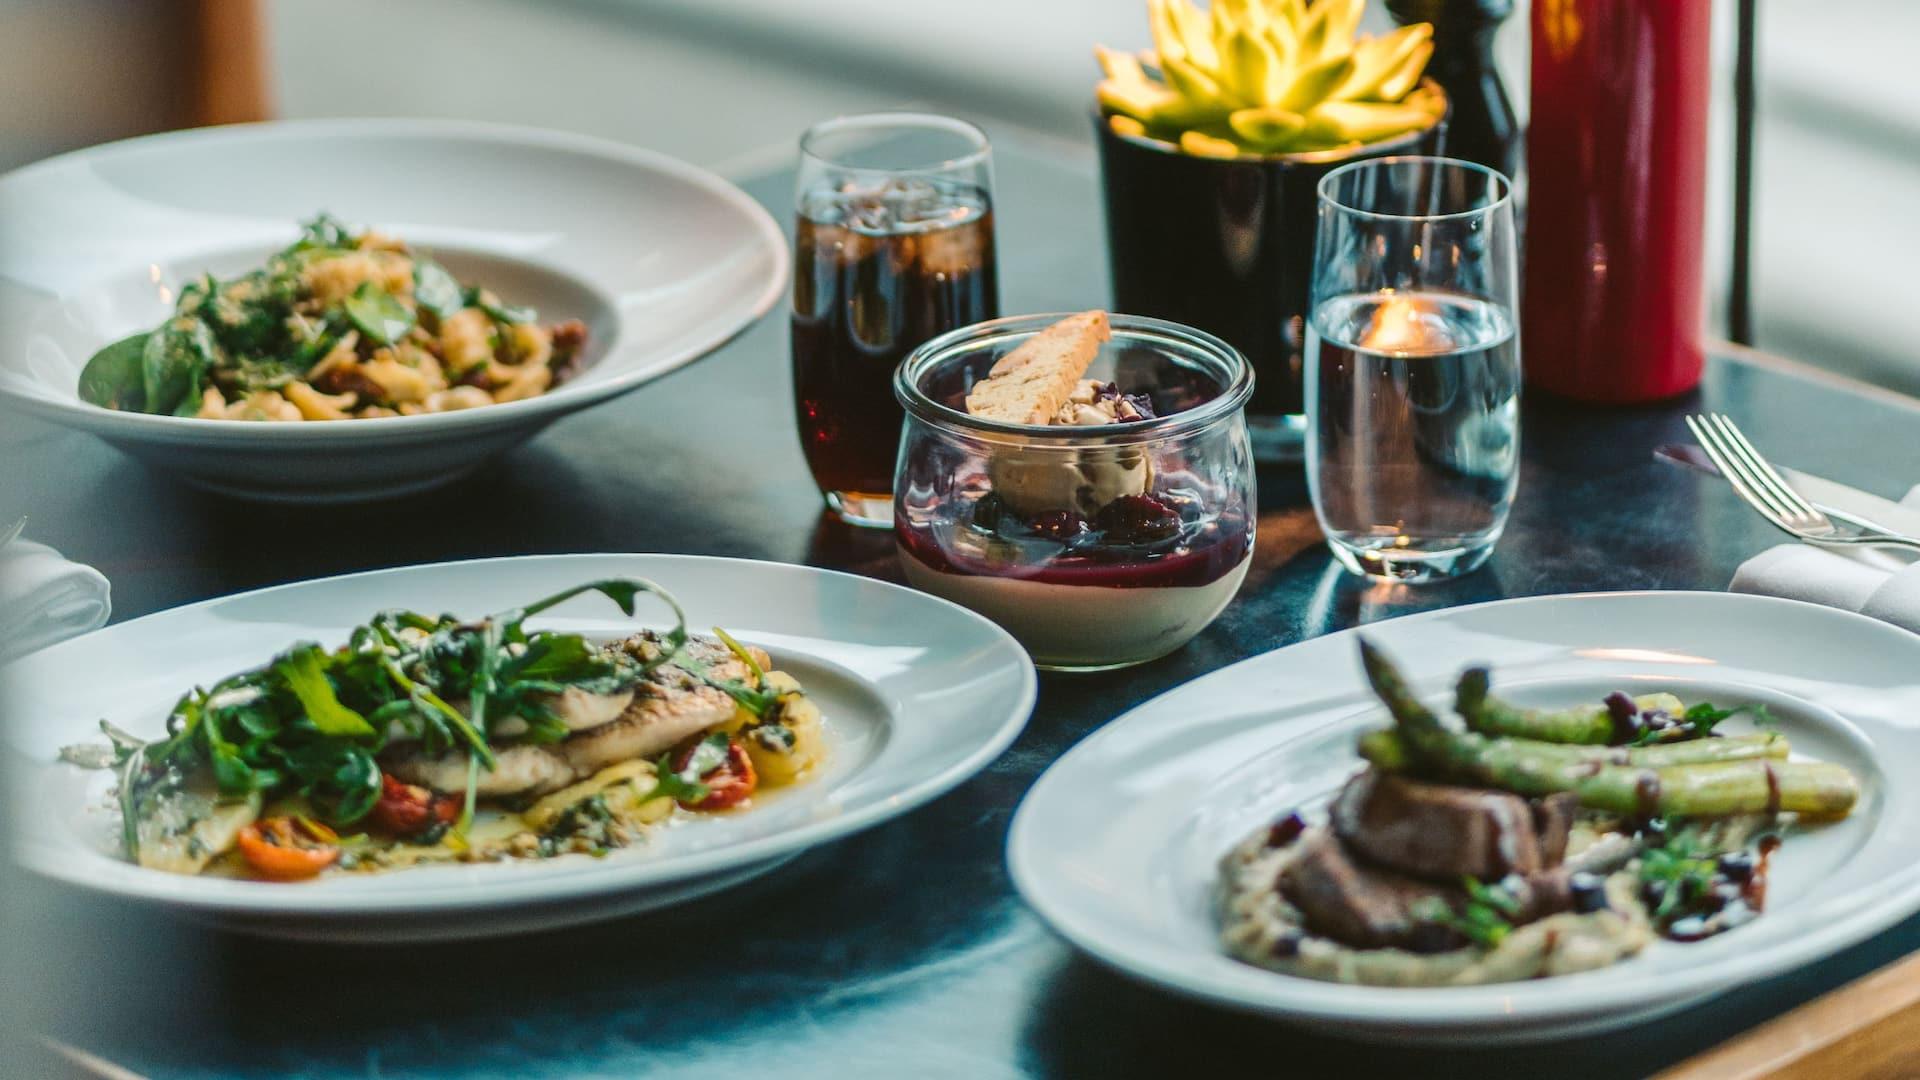 Tizian dishes at Grand Hyatt Berlin